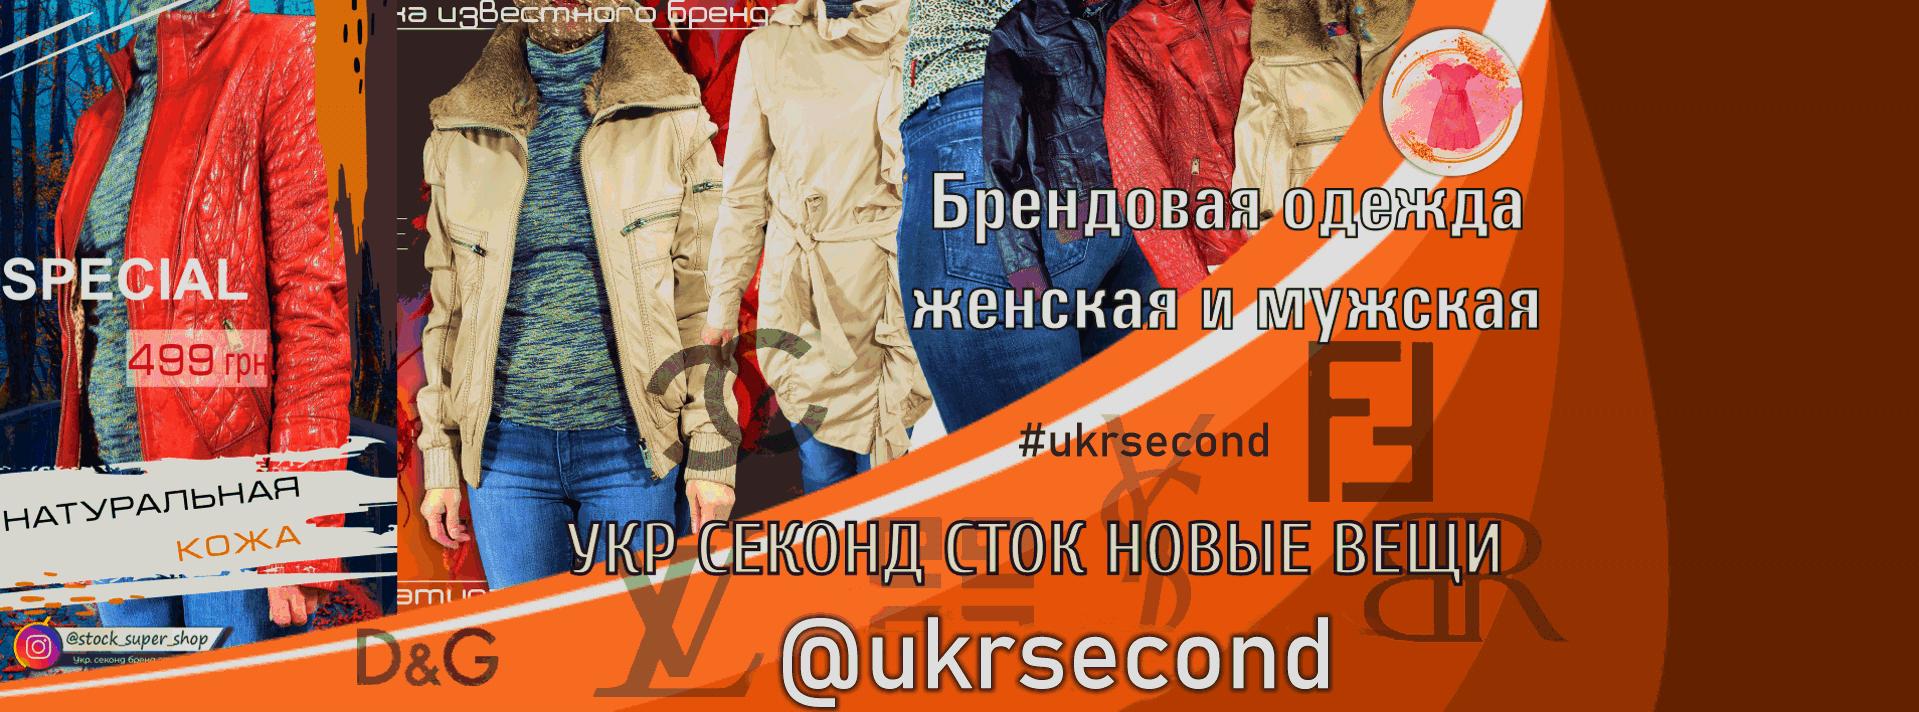 @ukrsecond